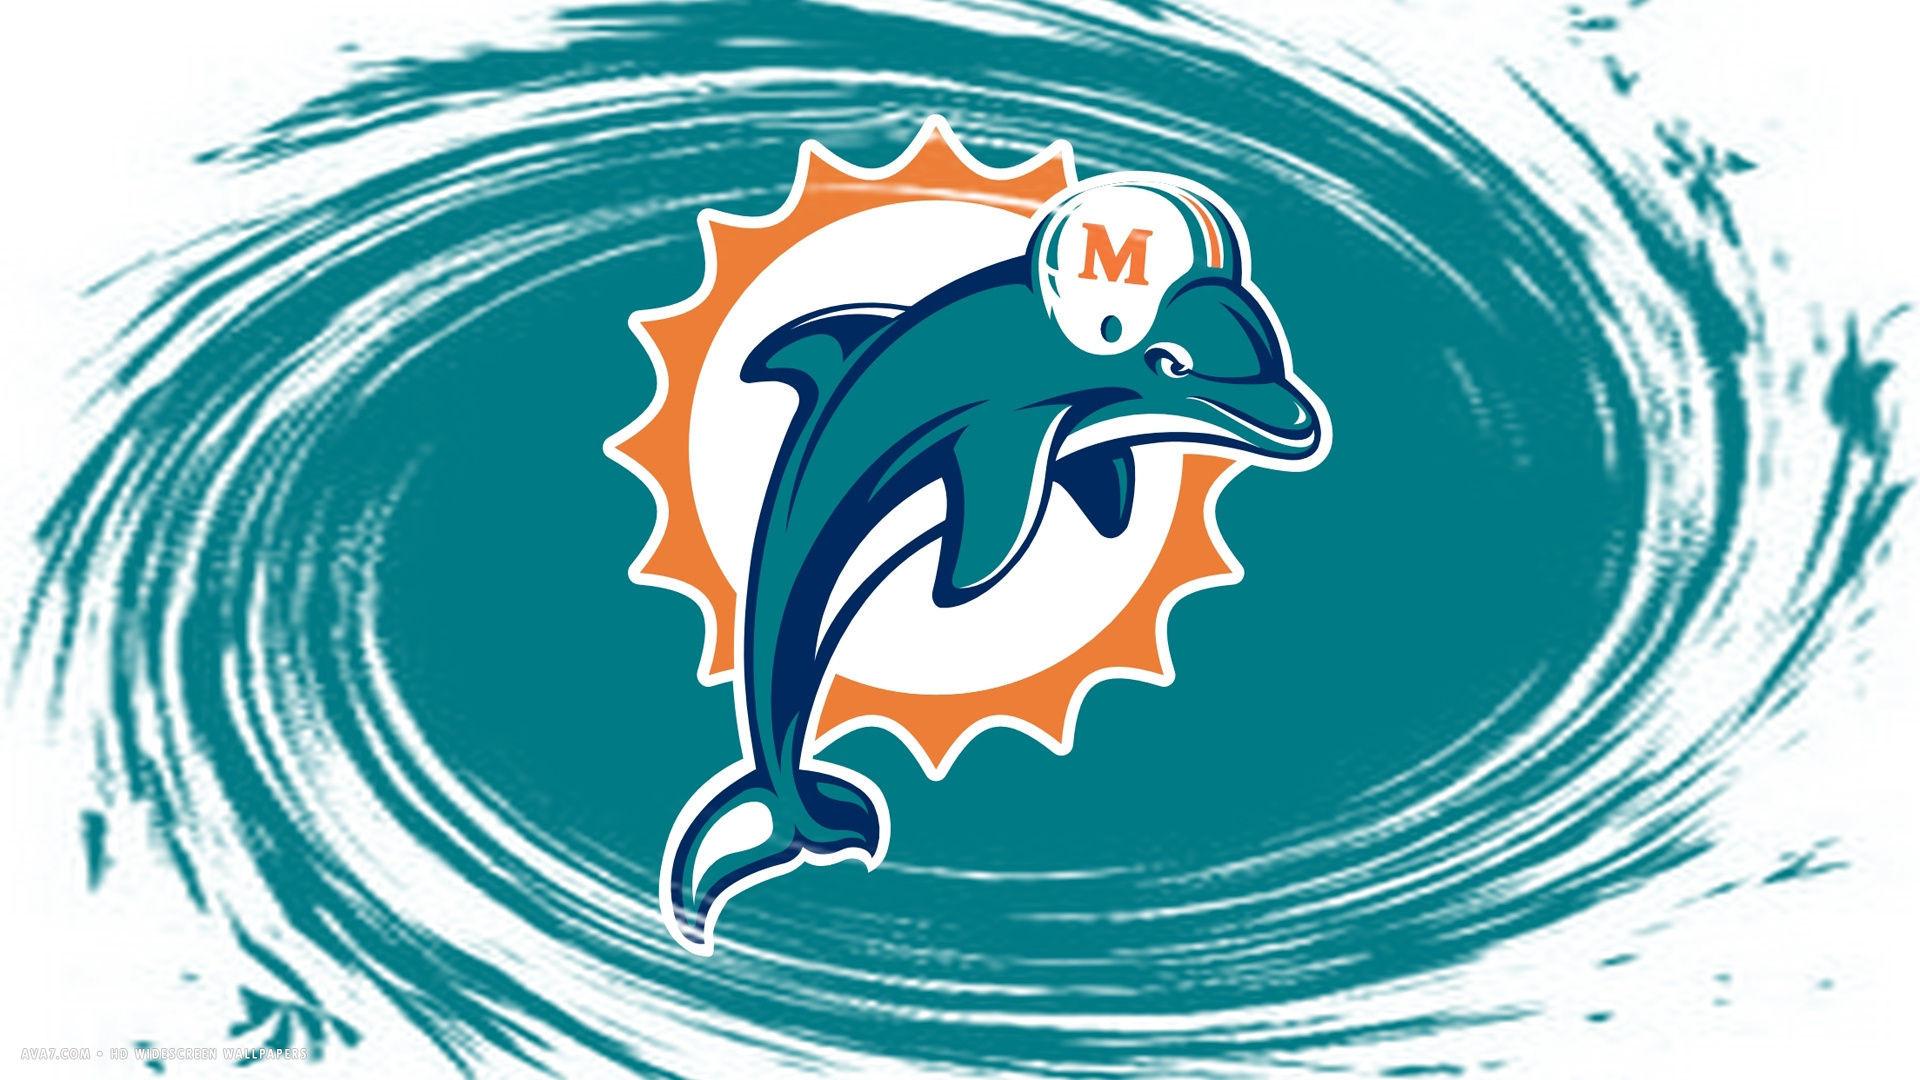 miami dolphins nfl football team hd widescreen wallpaper